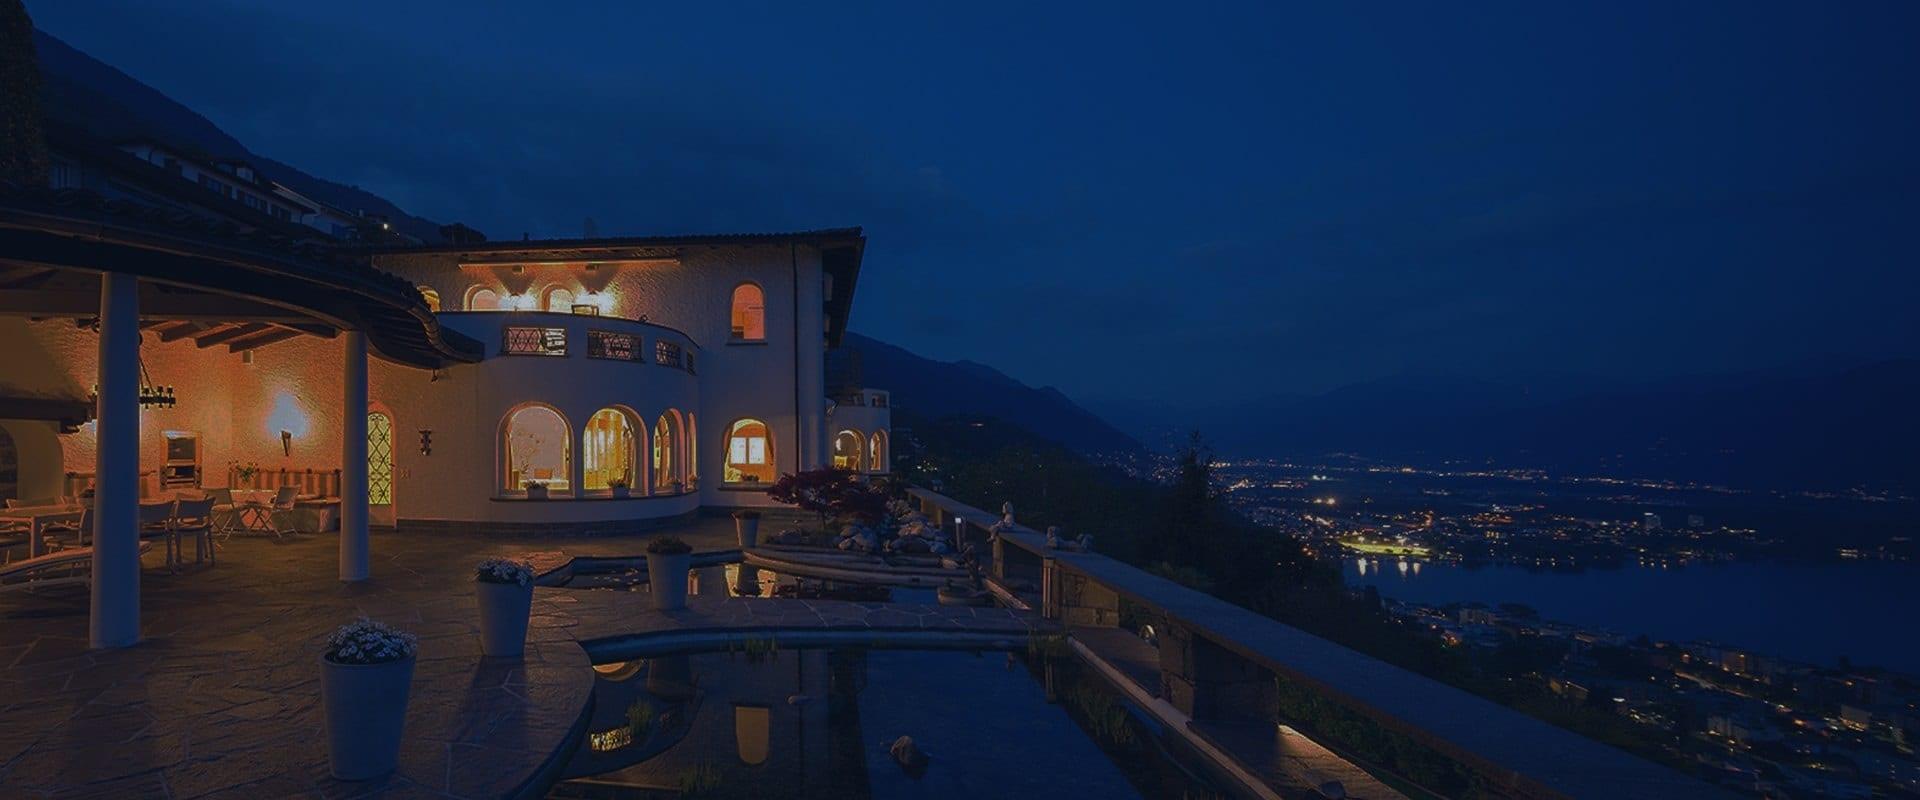 Luxury-Home-at-Night-8-min-0717